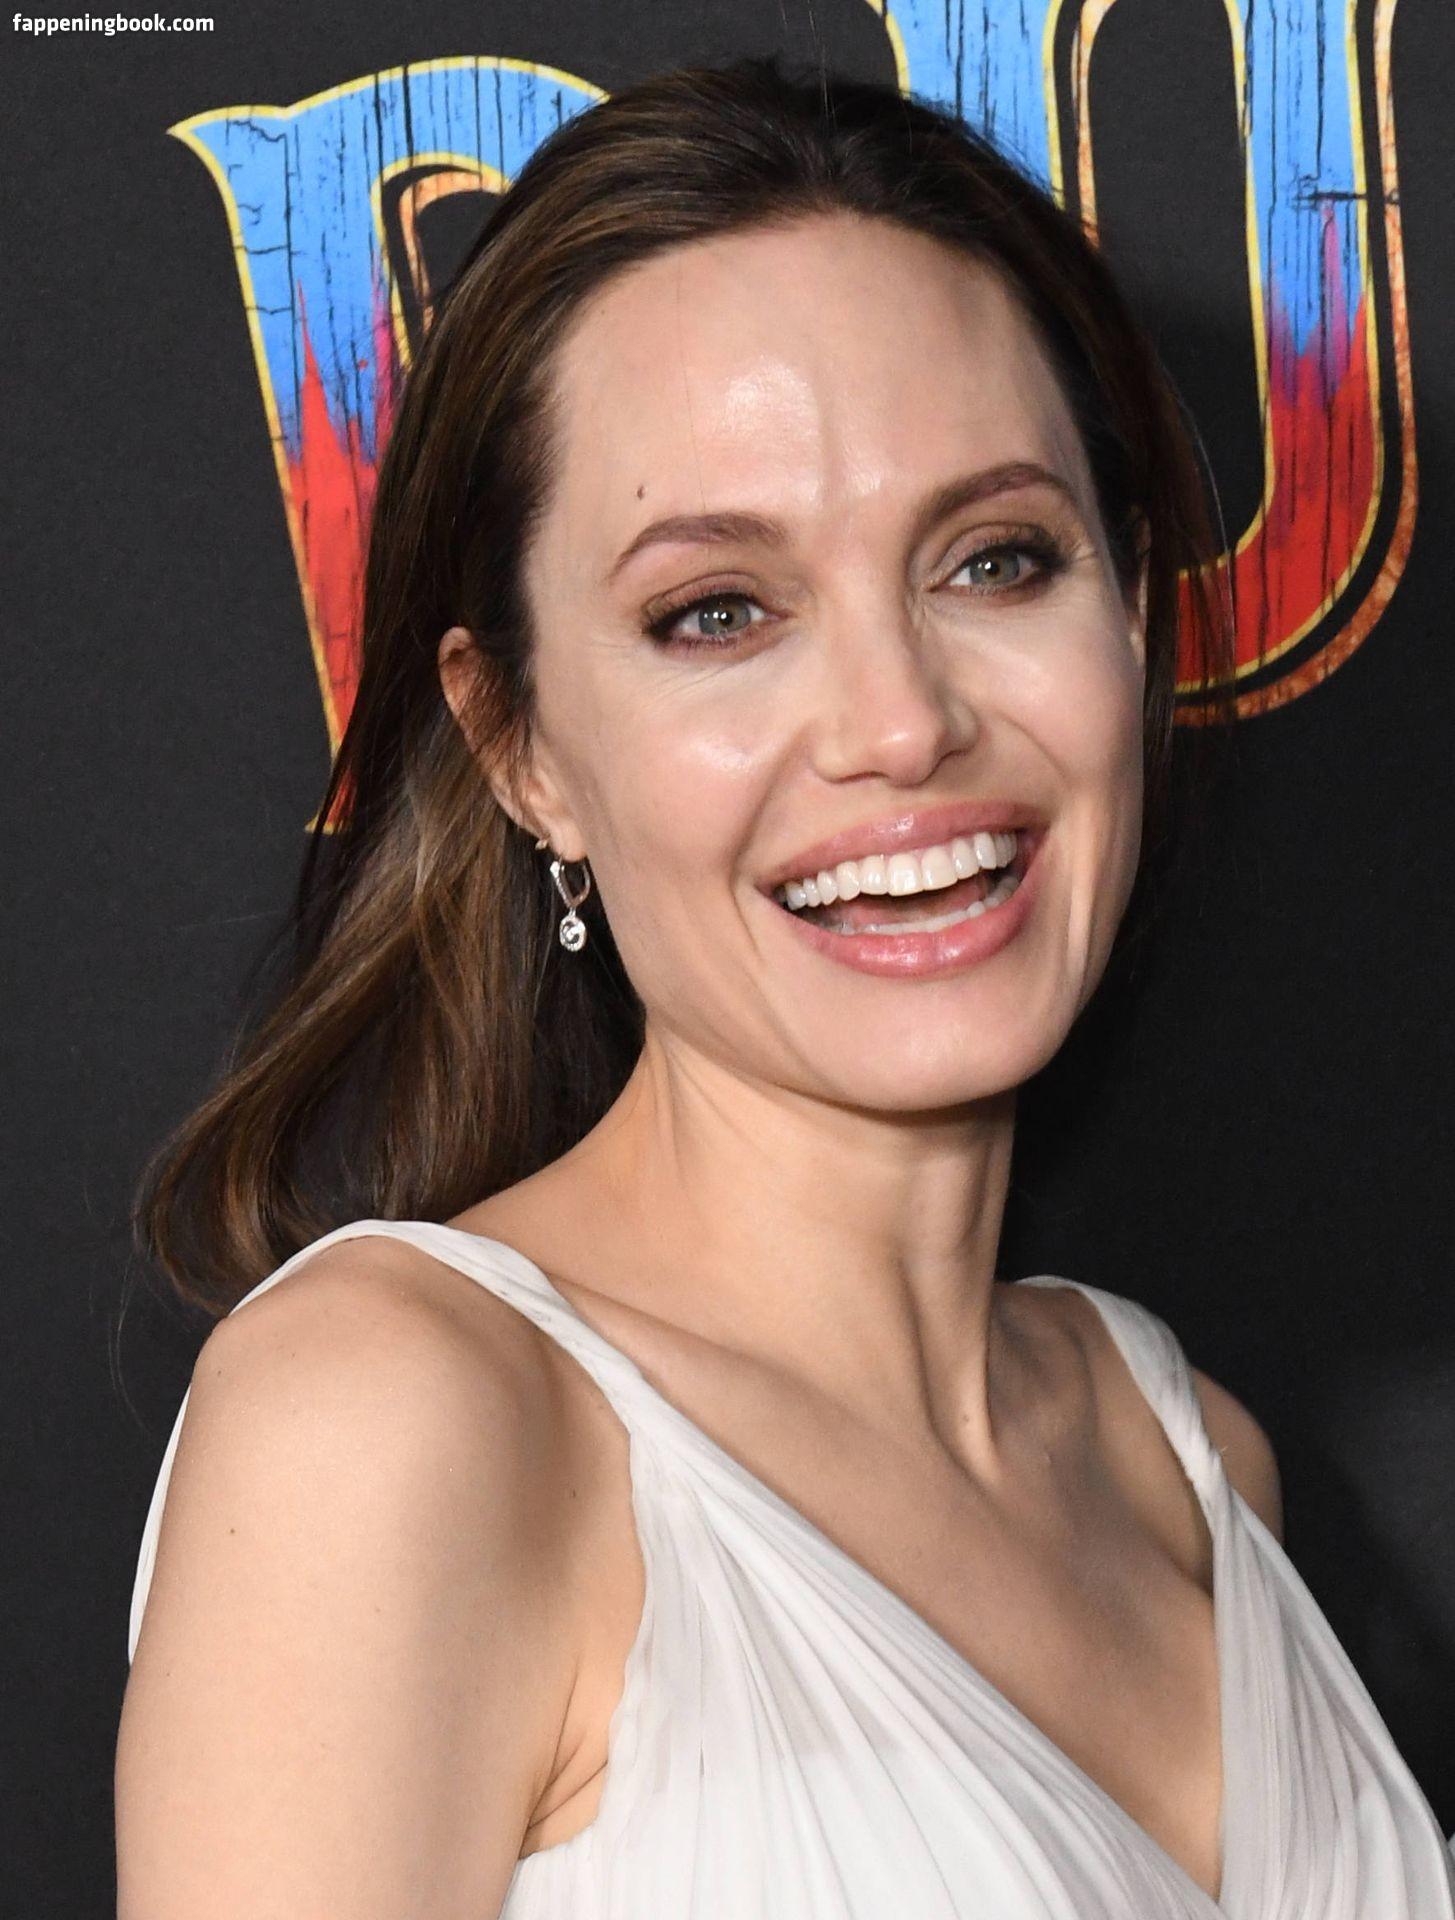 Celeb Angelina Jolie Nude Hot Free Images